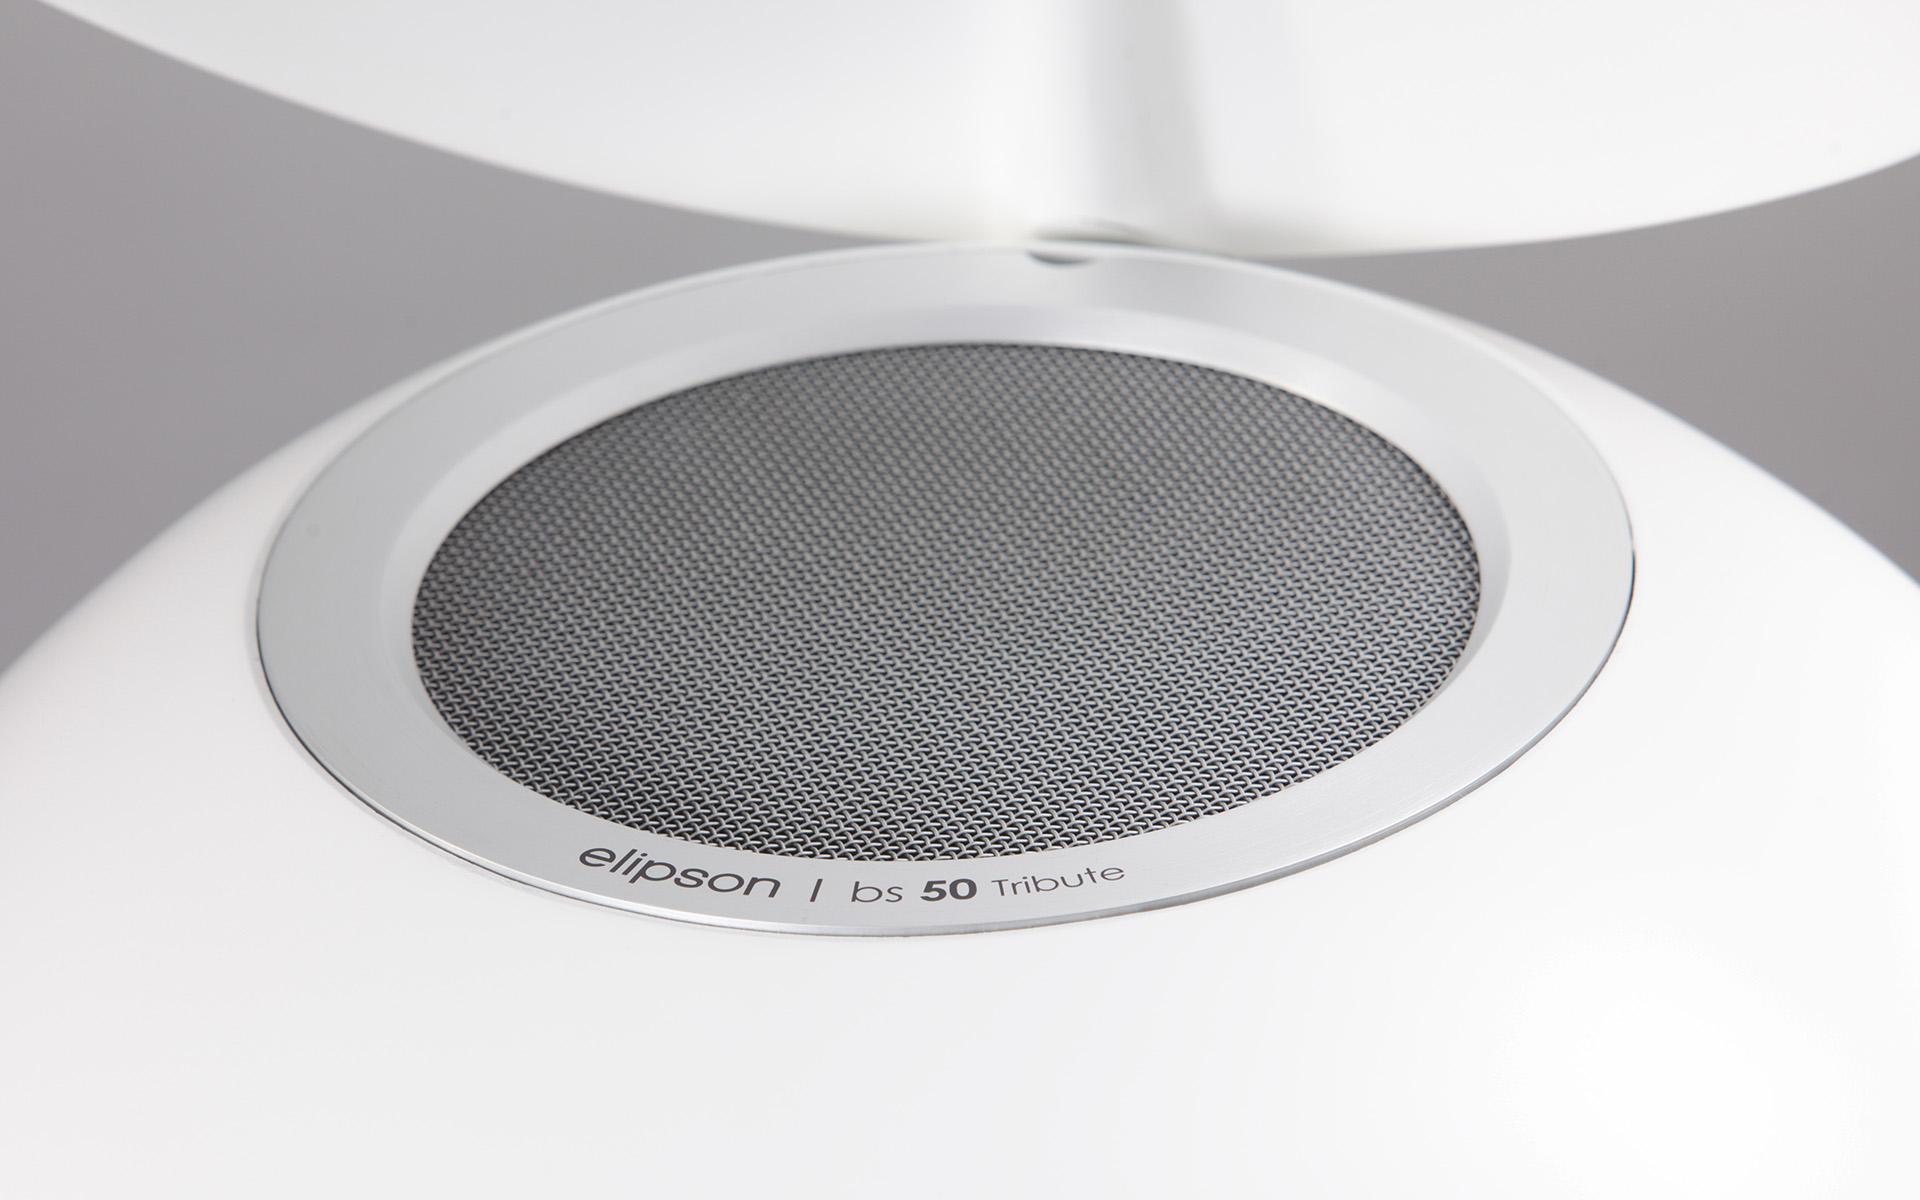 Elipson BS 50 Tribute: футуристическая концепция мощностью 80 Вт